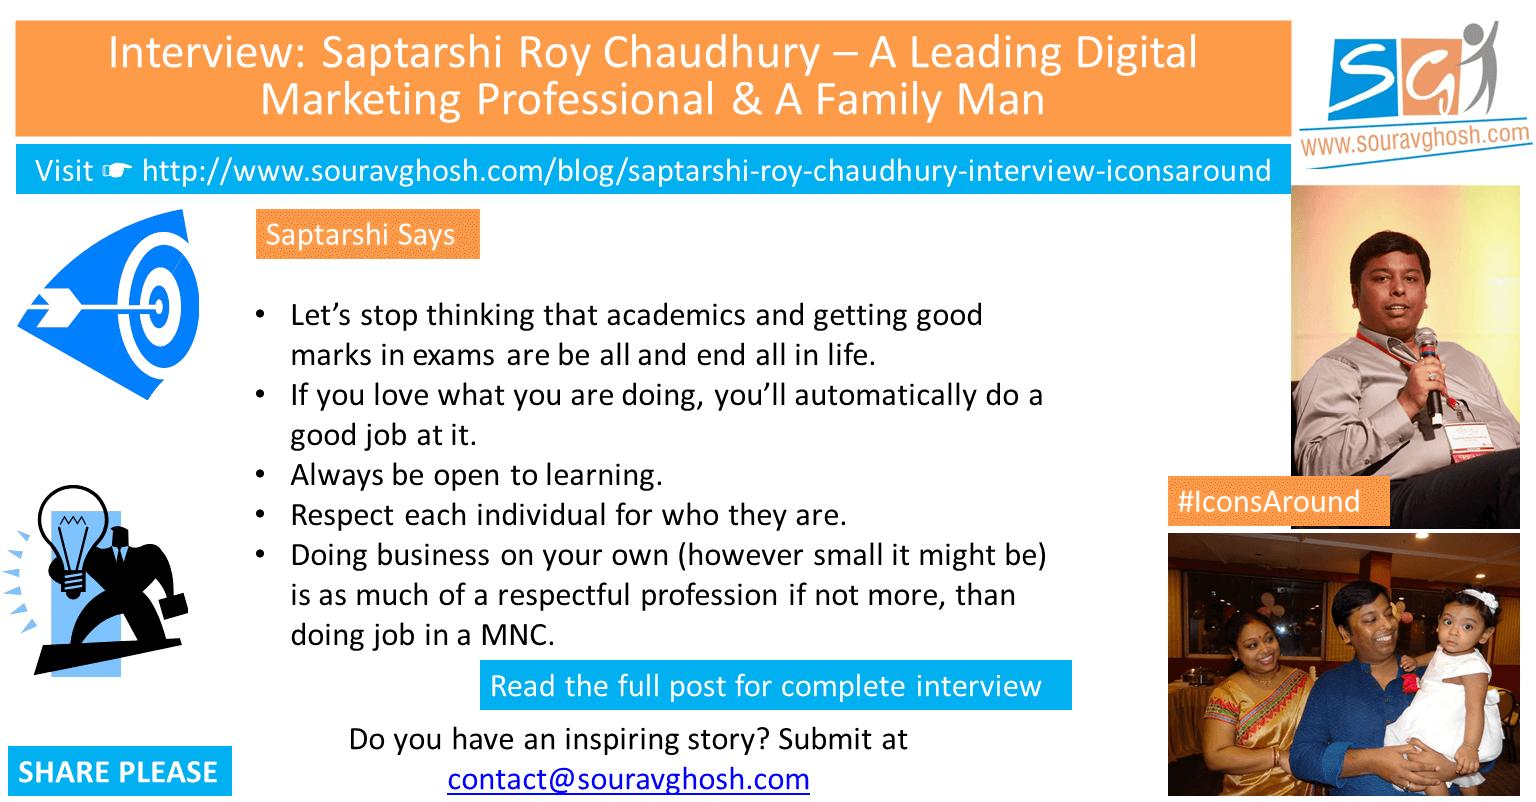 saptarshi-roy-chaudhury-interview-iconsaround